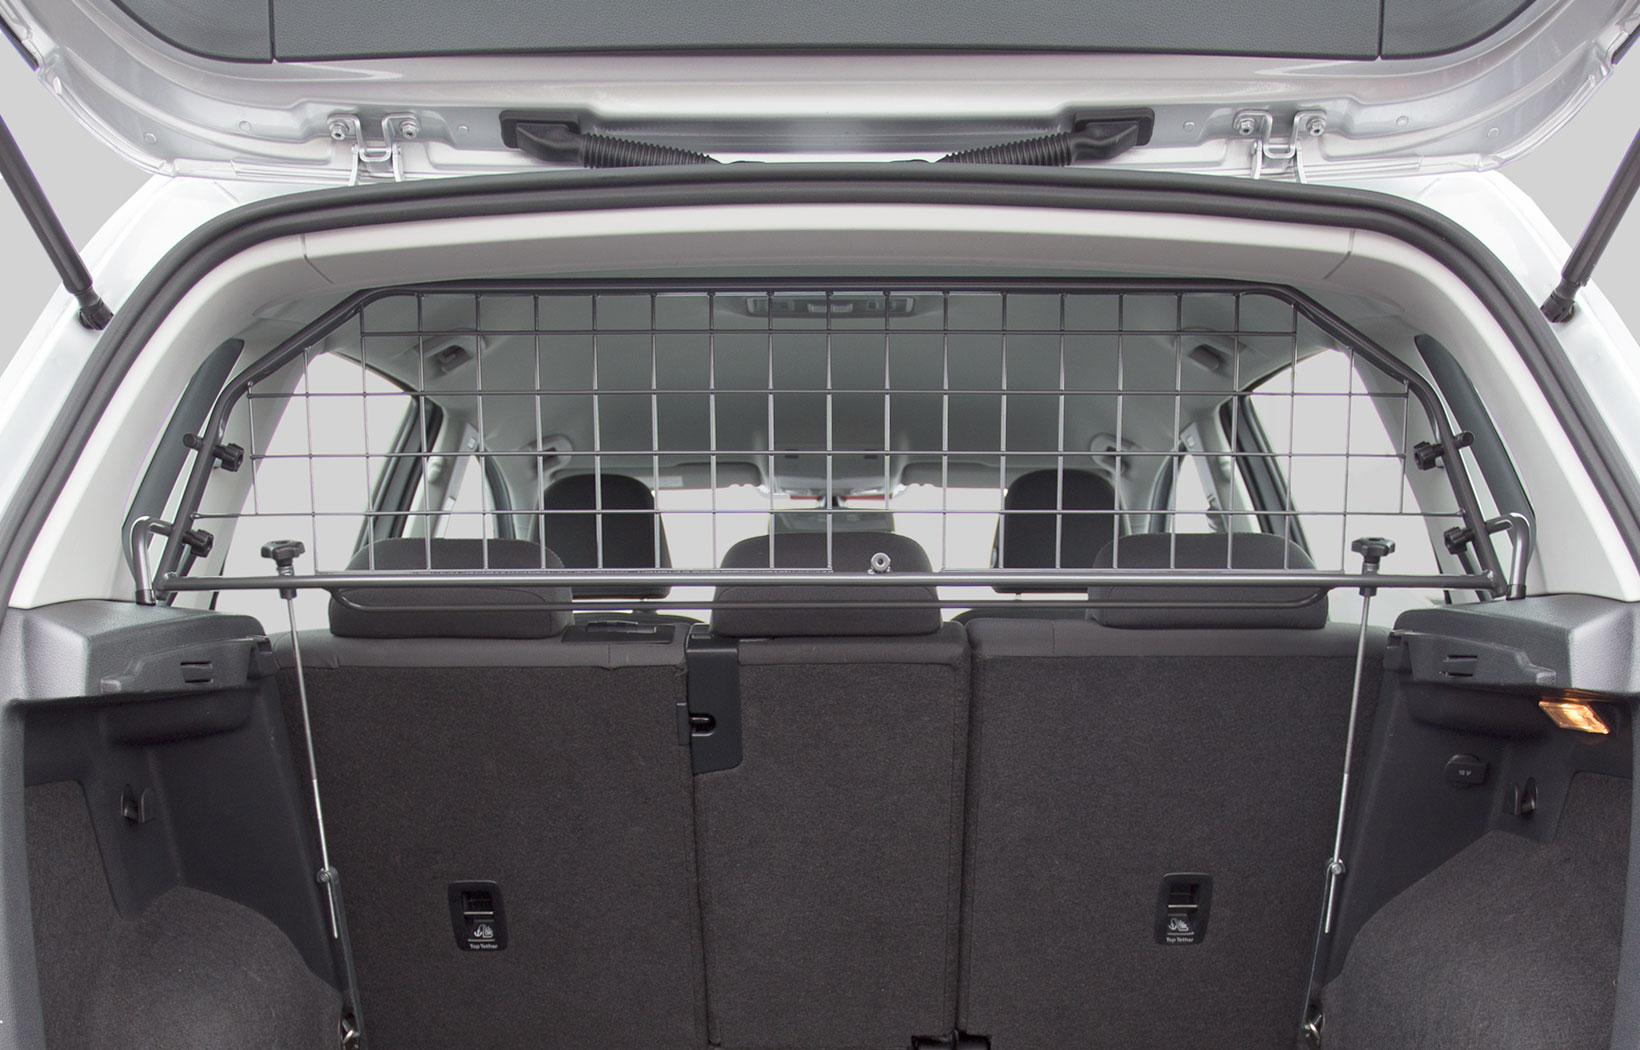 Bmw Accessories Buy Vehicle Specific Bmw Accessories